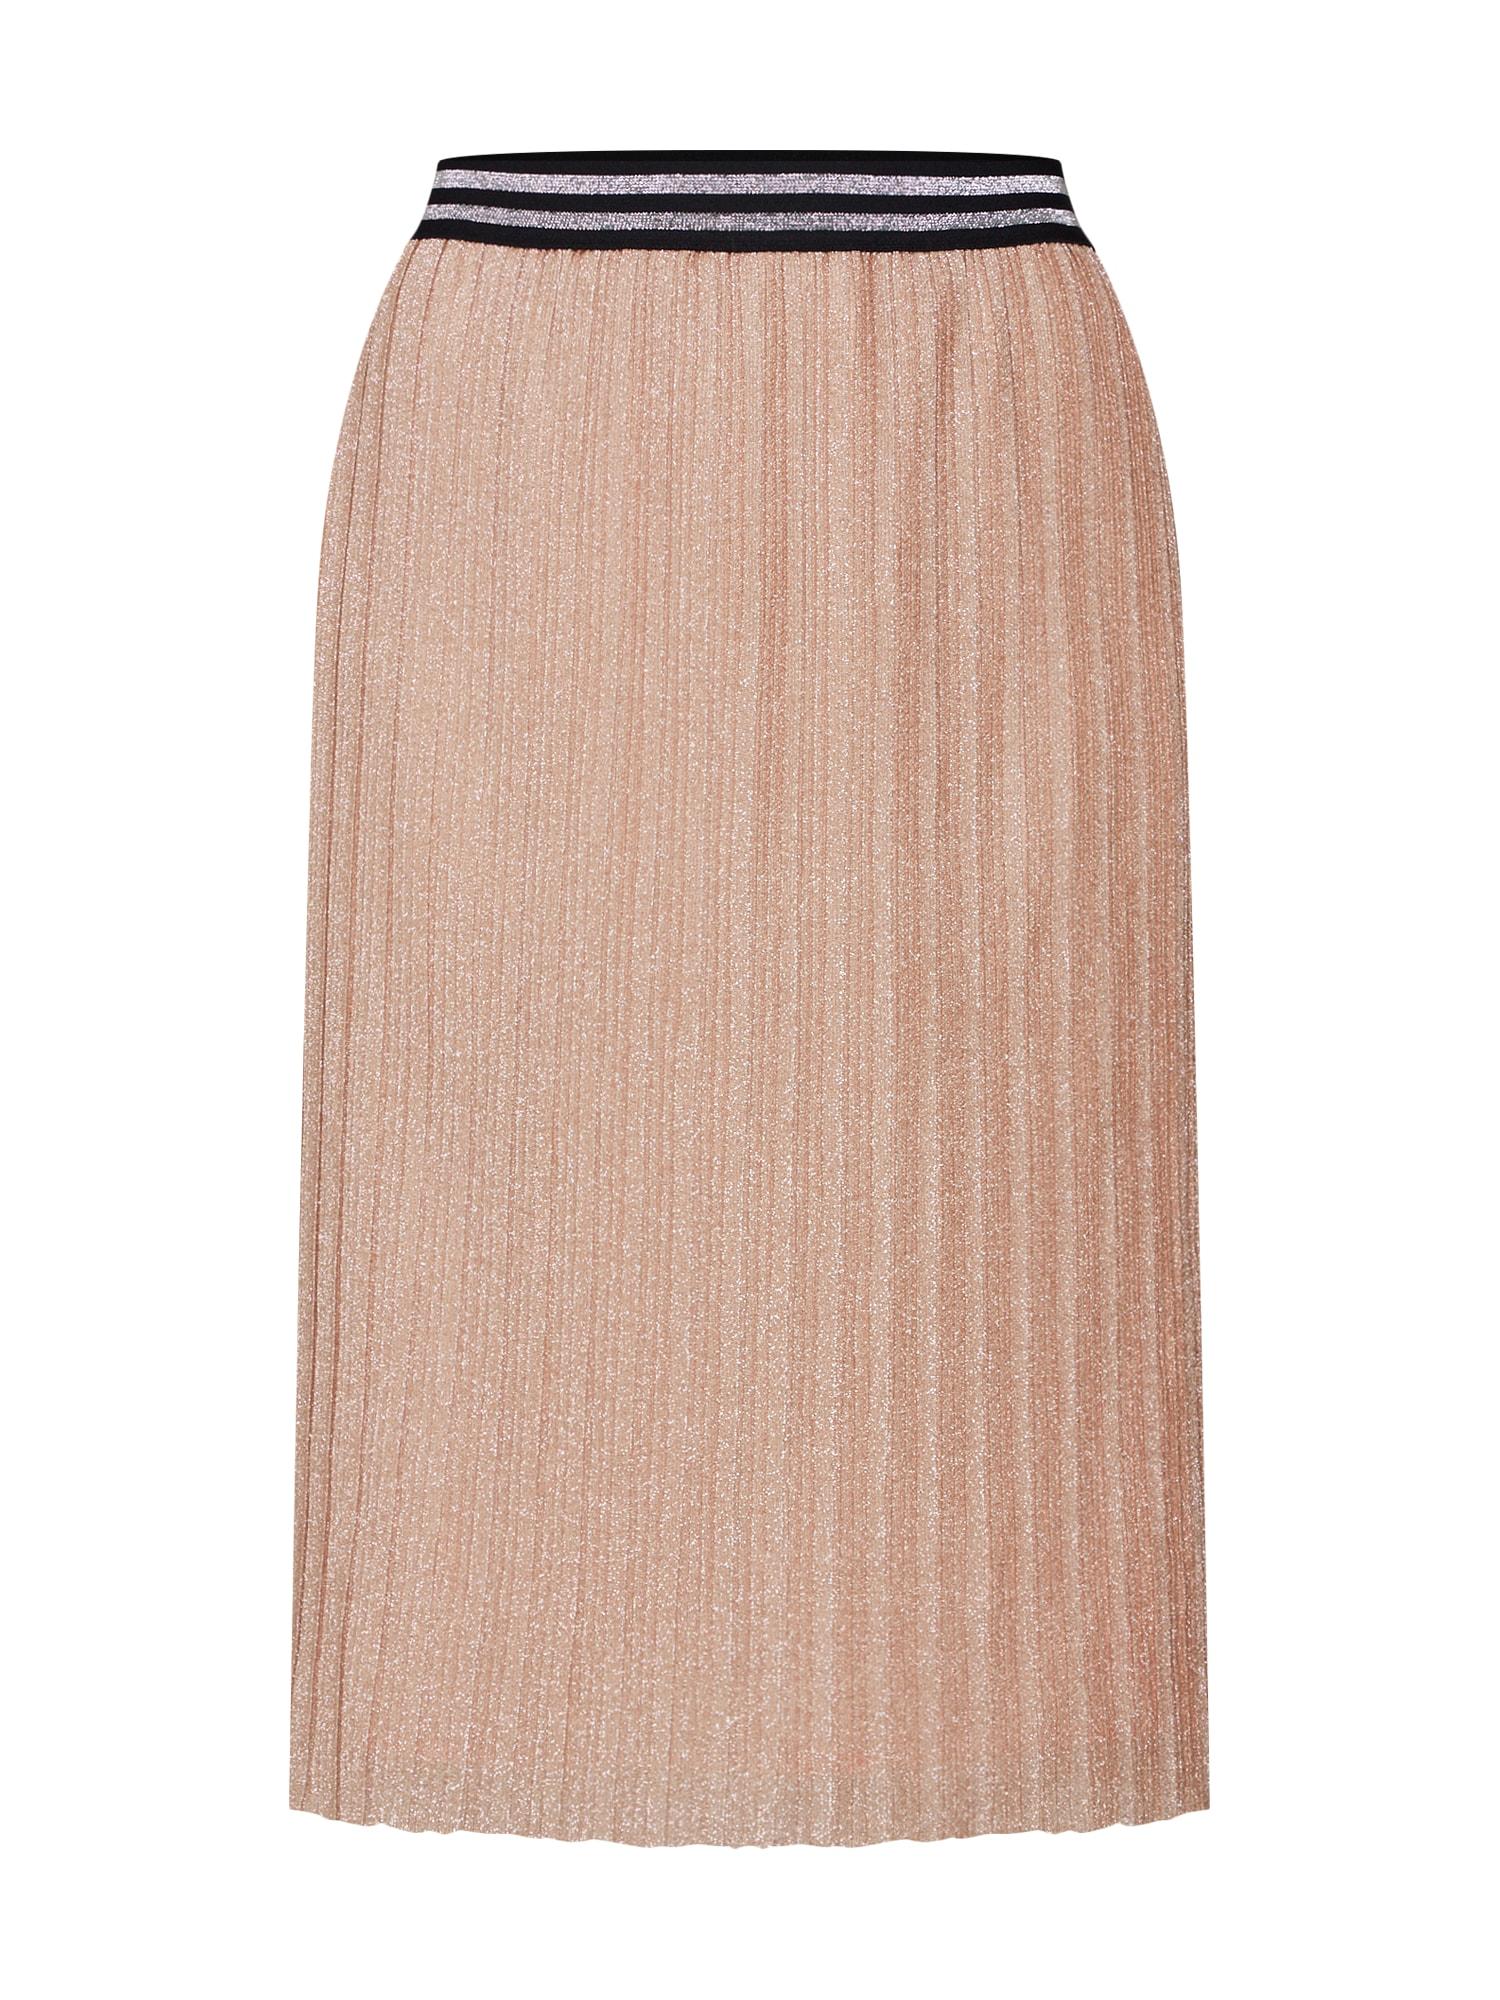 Sukně růžová černá Sofie Schnoor